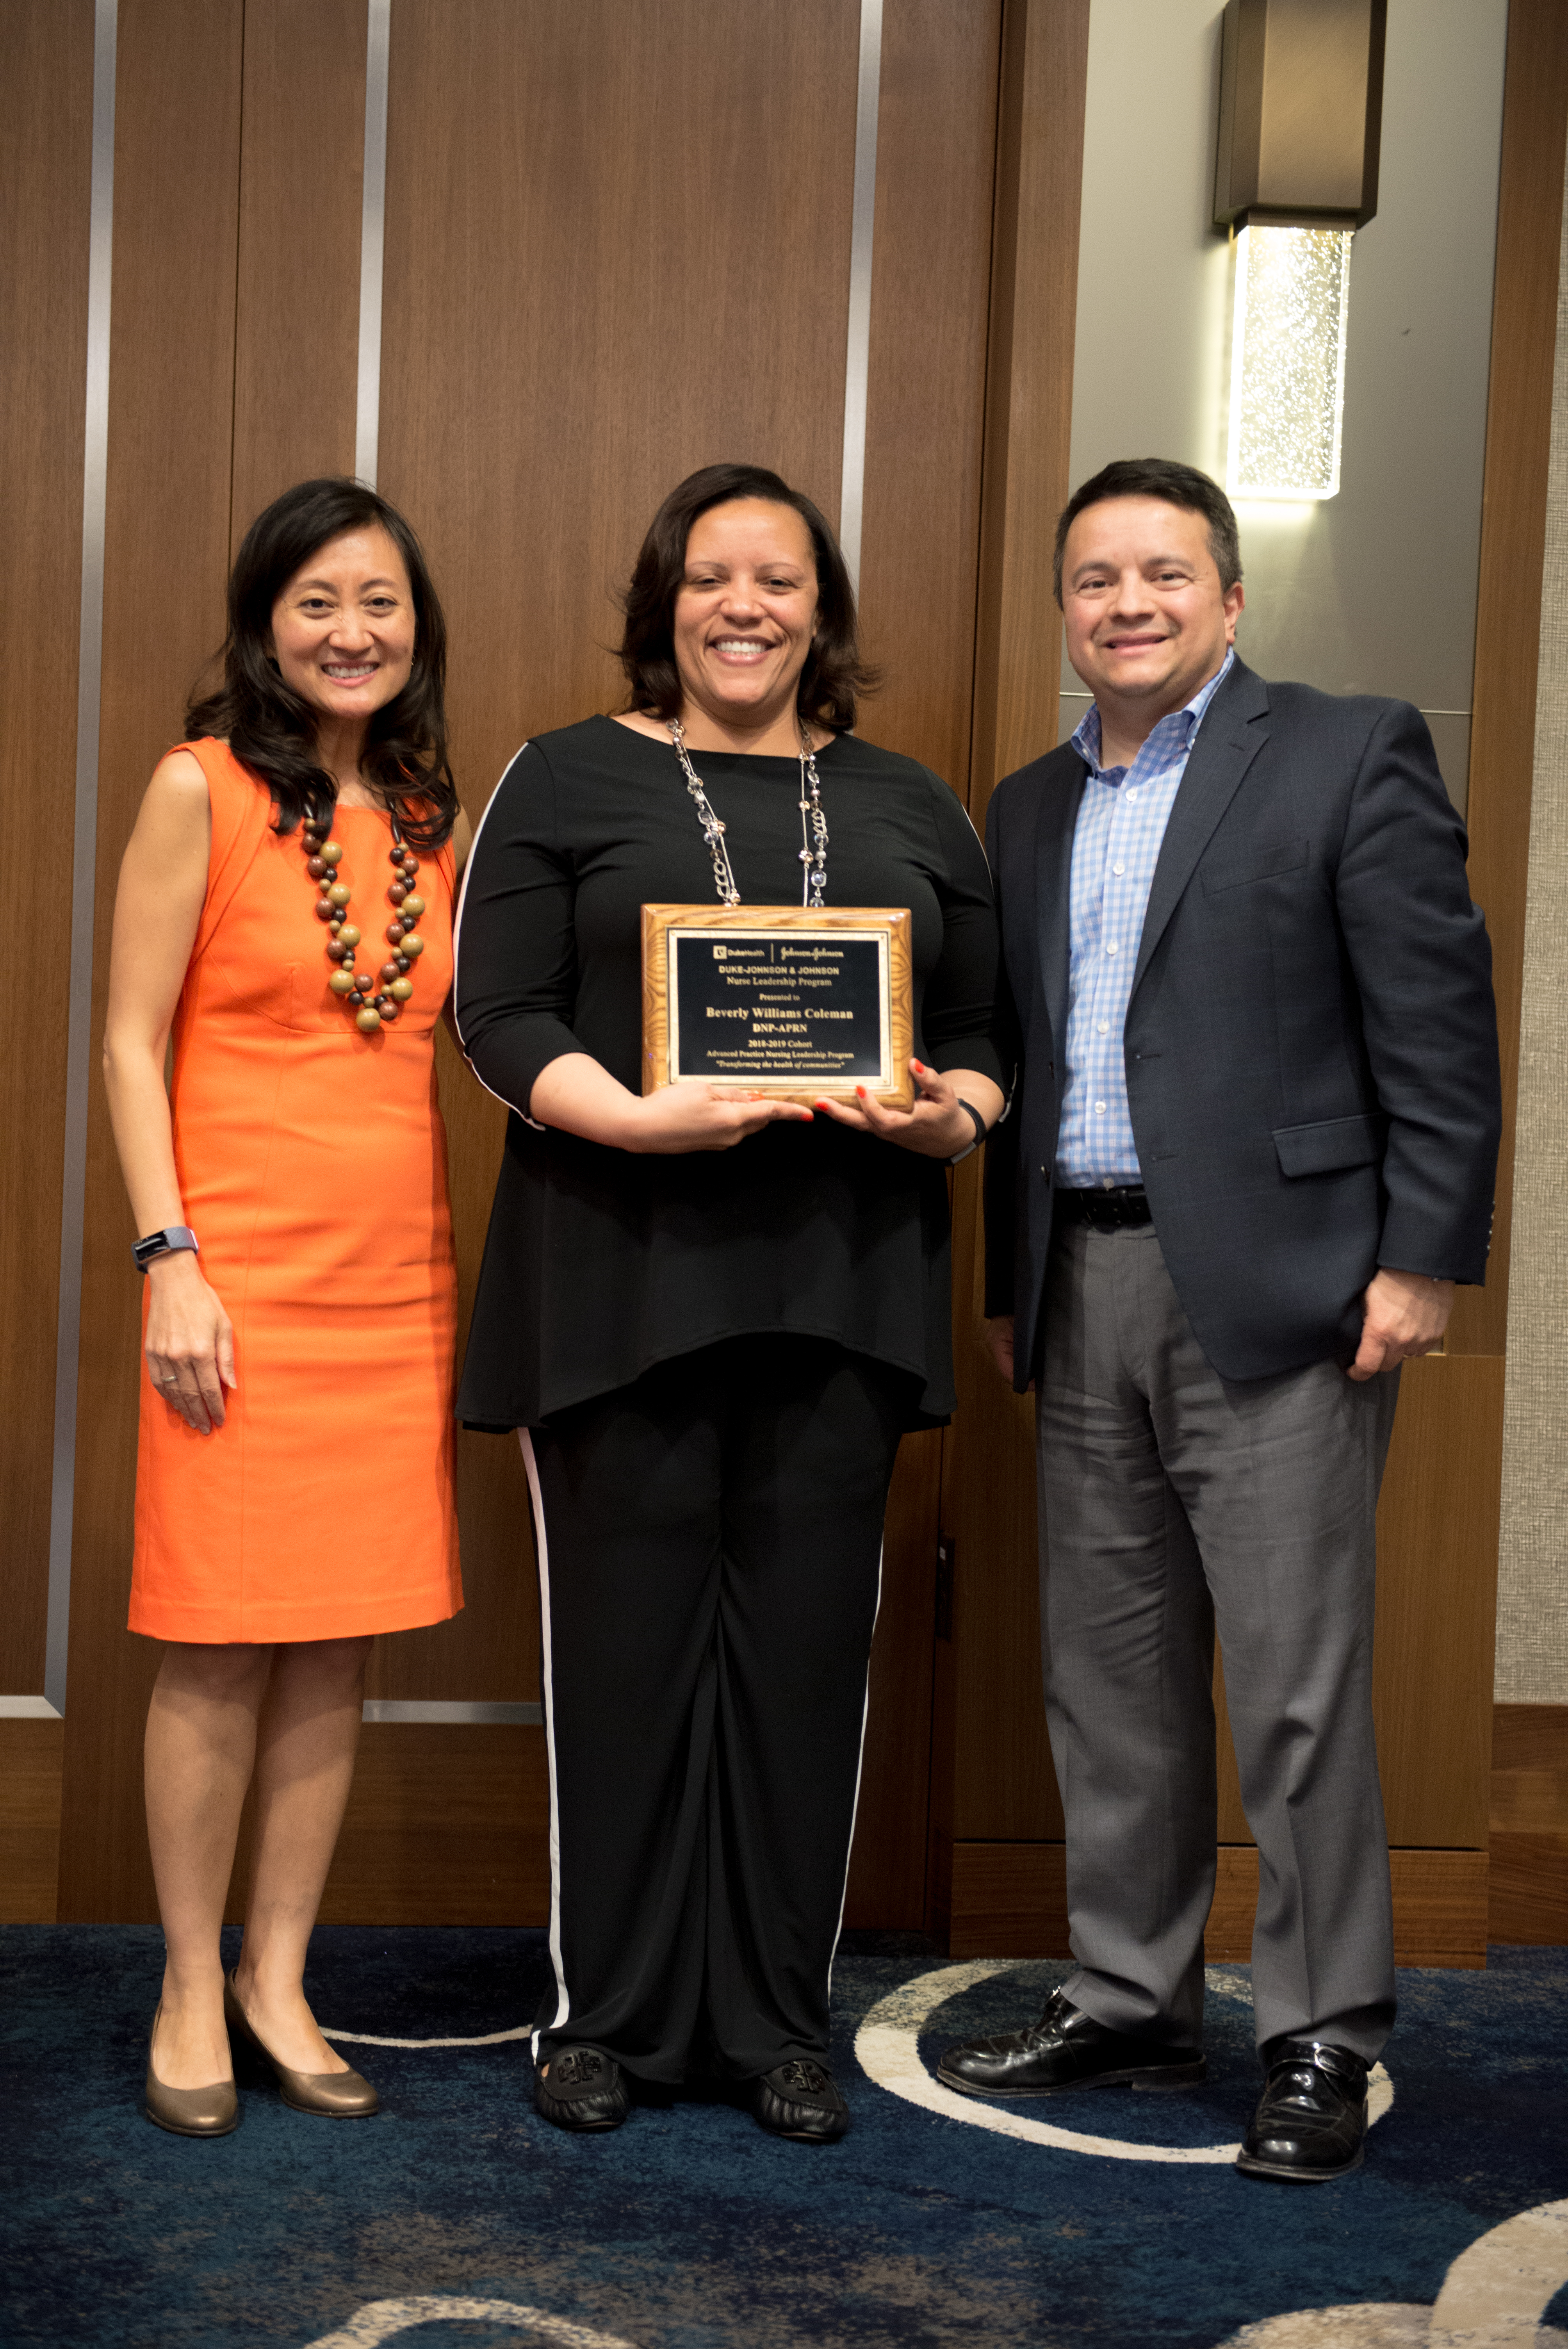 Assistant professor graduates Duke-Johnson & Johnson Nurse Leadership Program